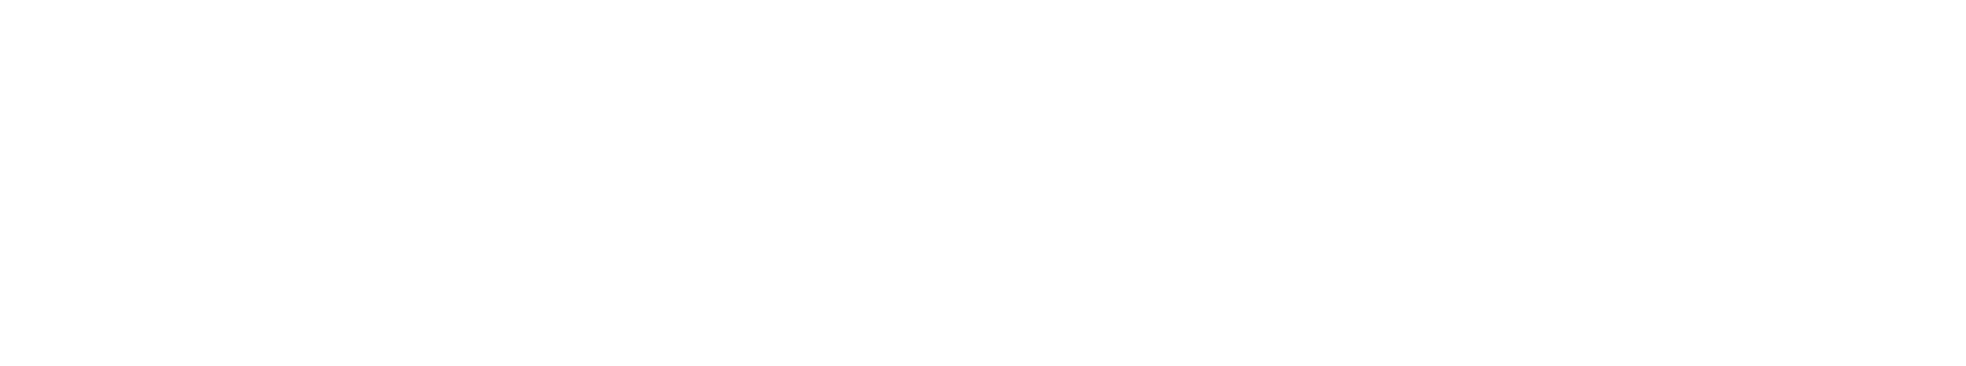 Australian Government logo with screen Australia logo